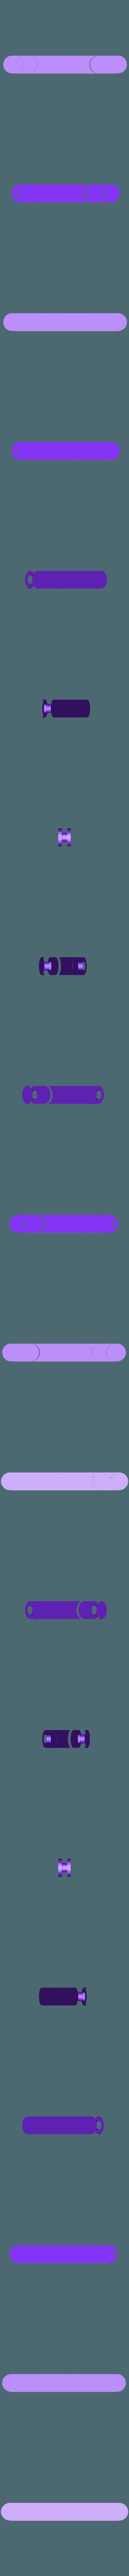 7cm_Strap_Pegs.stl Download free STL file Flexible Filament Bikini Top and Bottom • 3D printable design, SexyCyborg